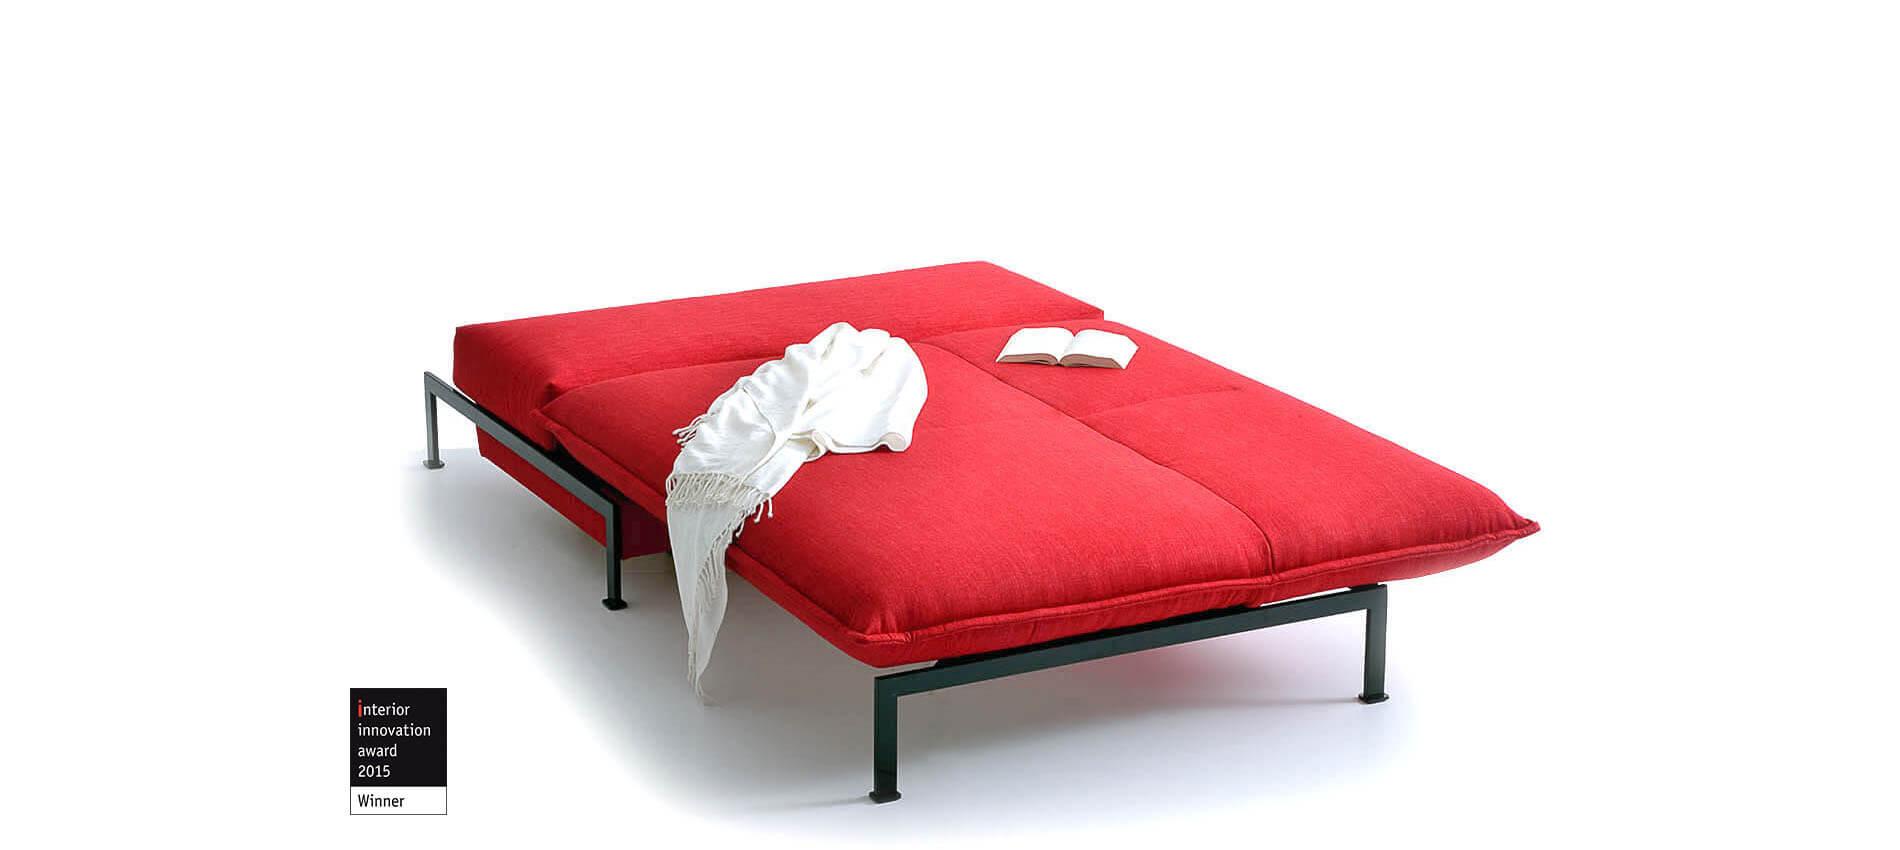 Franz Fertig Schlafsofa Fun Flexibles Sofa Mit Bett